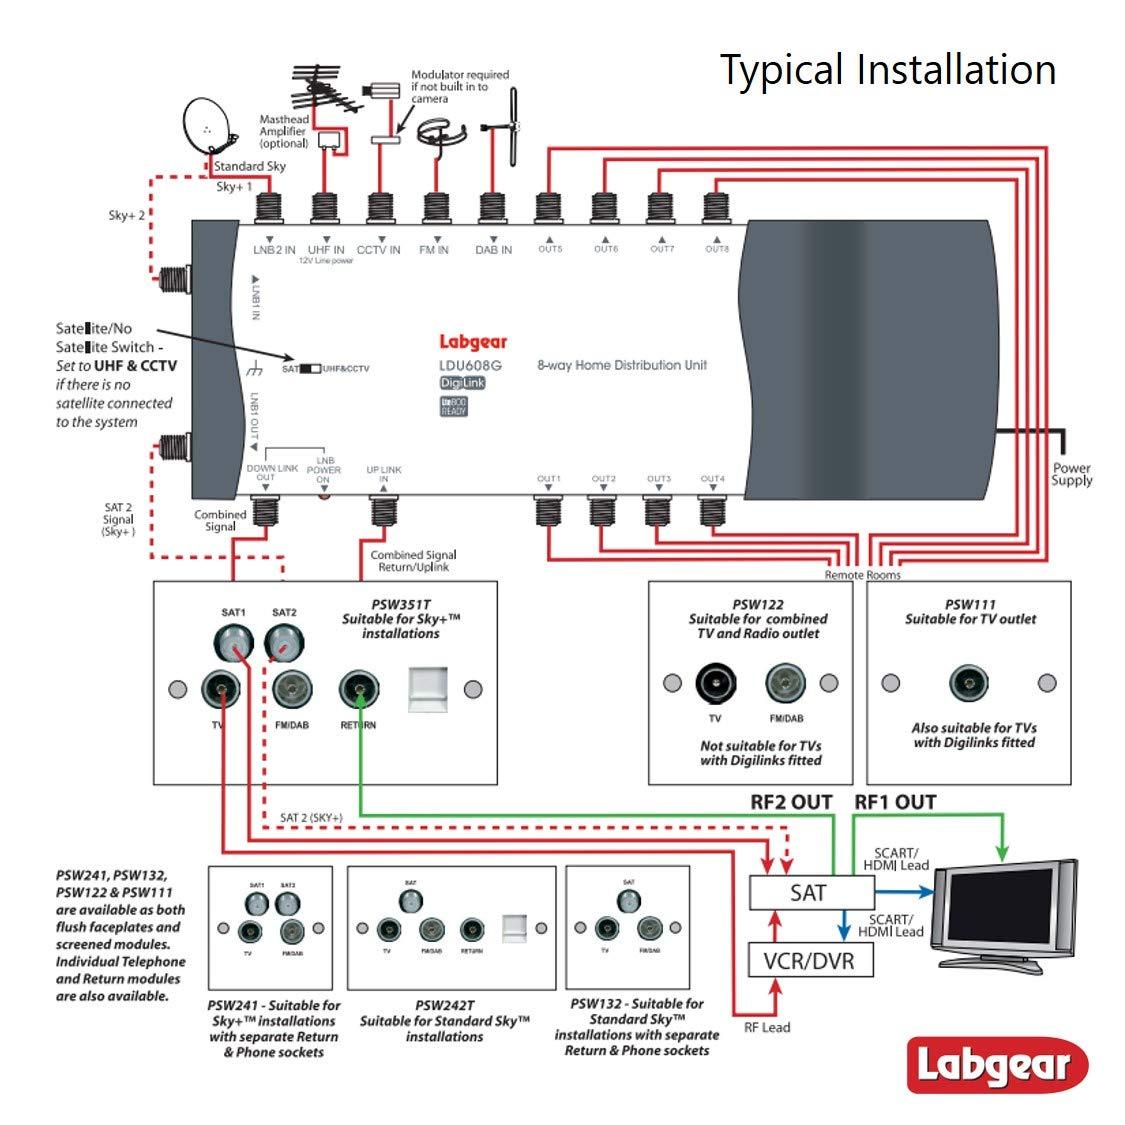 Distribution Amplifier, Lear LDU608G 8 Way Home Distribution Unit - on